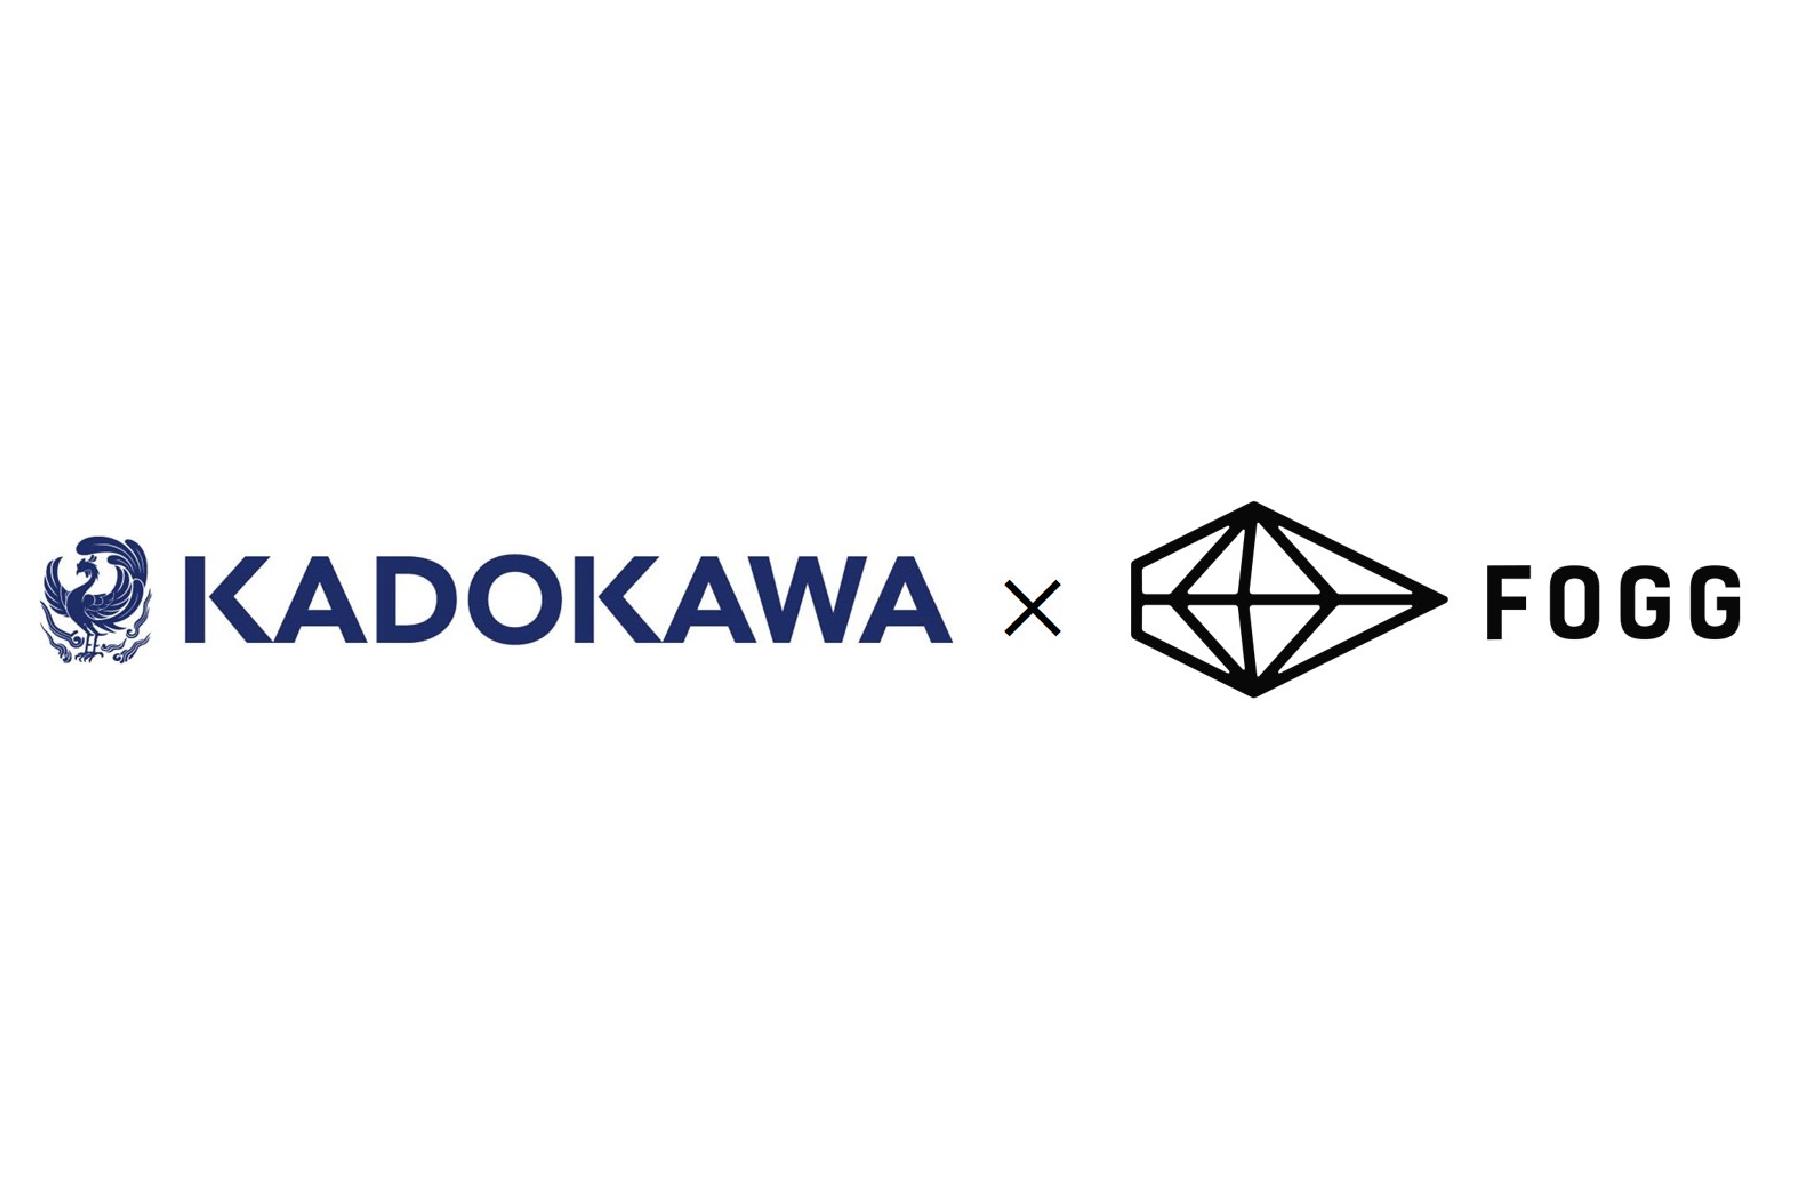 KADOKAWA×フォッグ | オーディション主催者が抱える課題を包括的にサポートするため業務提携